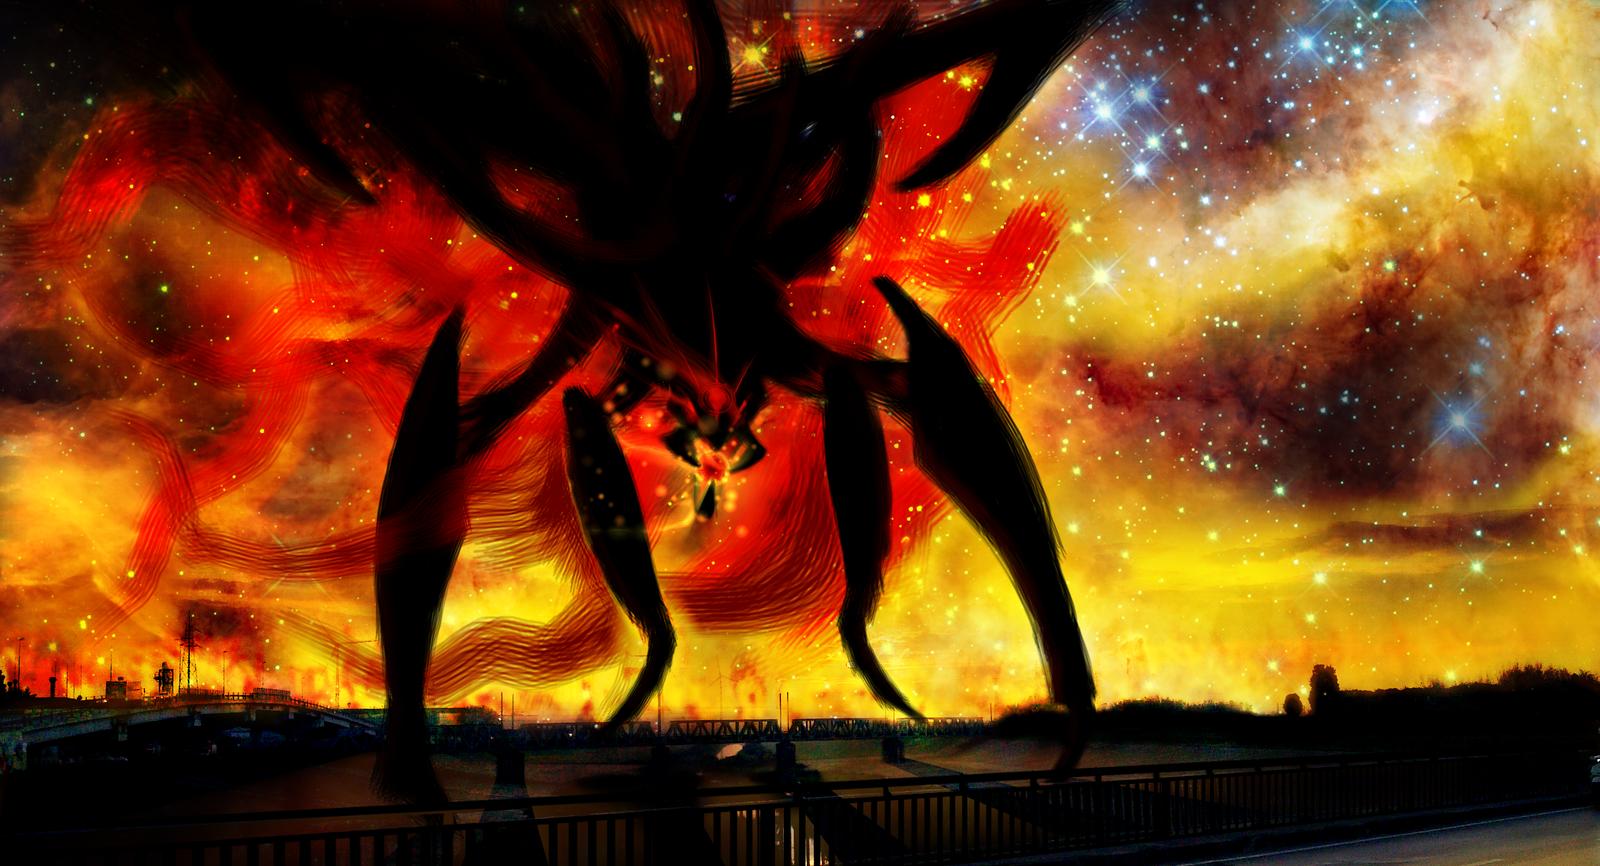 Neo-LUX La Tecnocrata de los Masaari Alien_war_machine_n2_by_dreefire-d4kakki